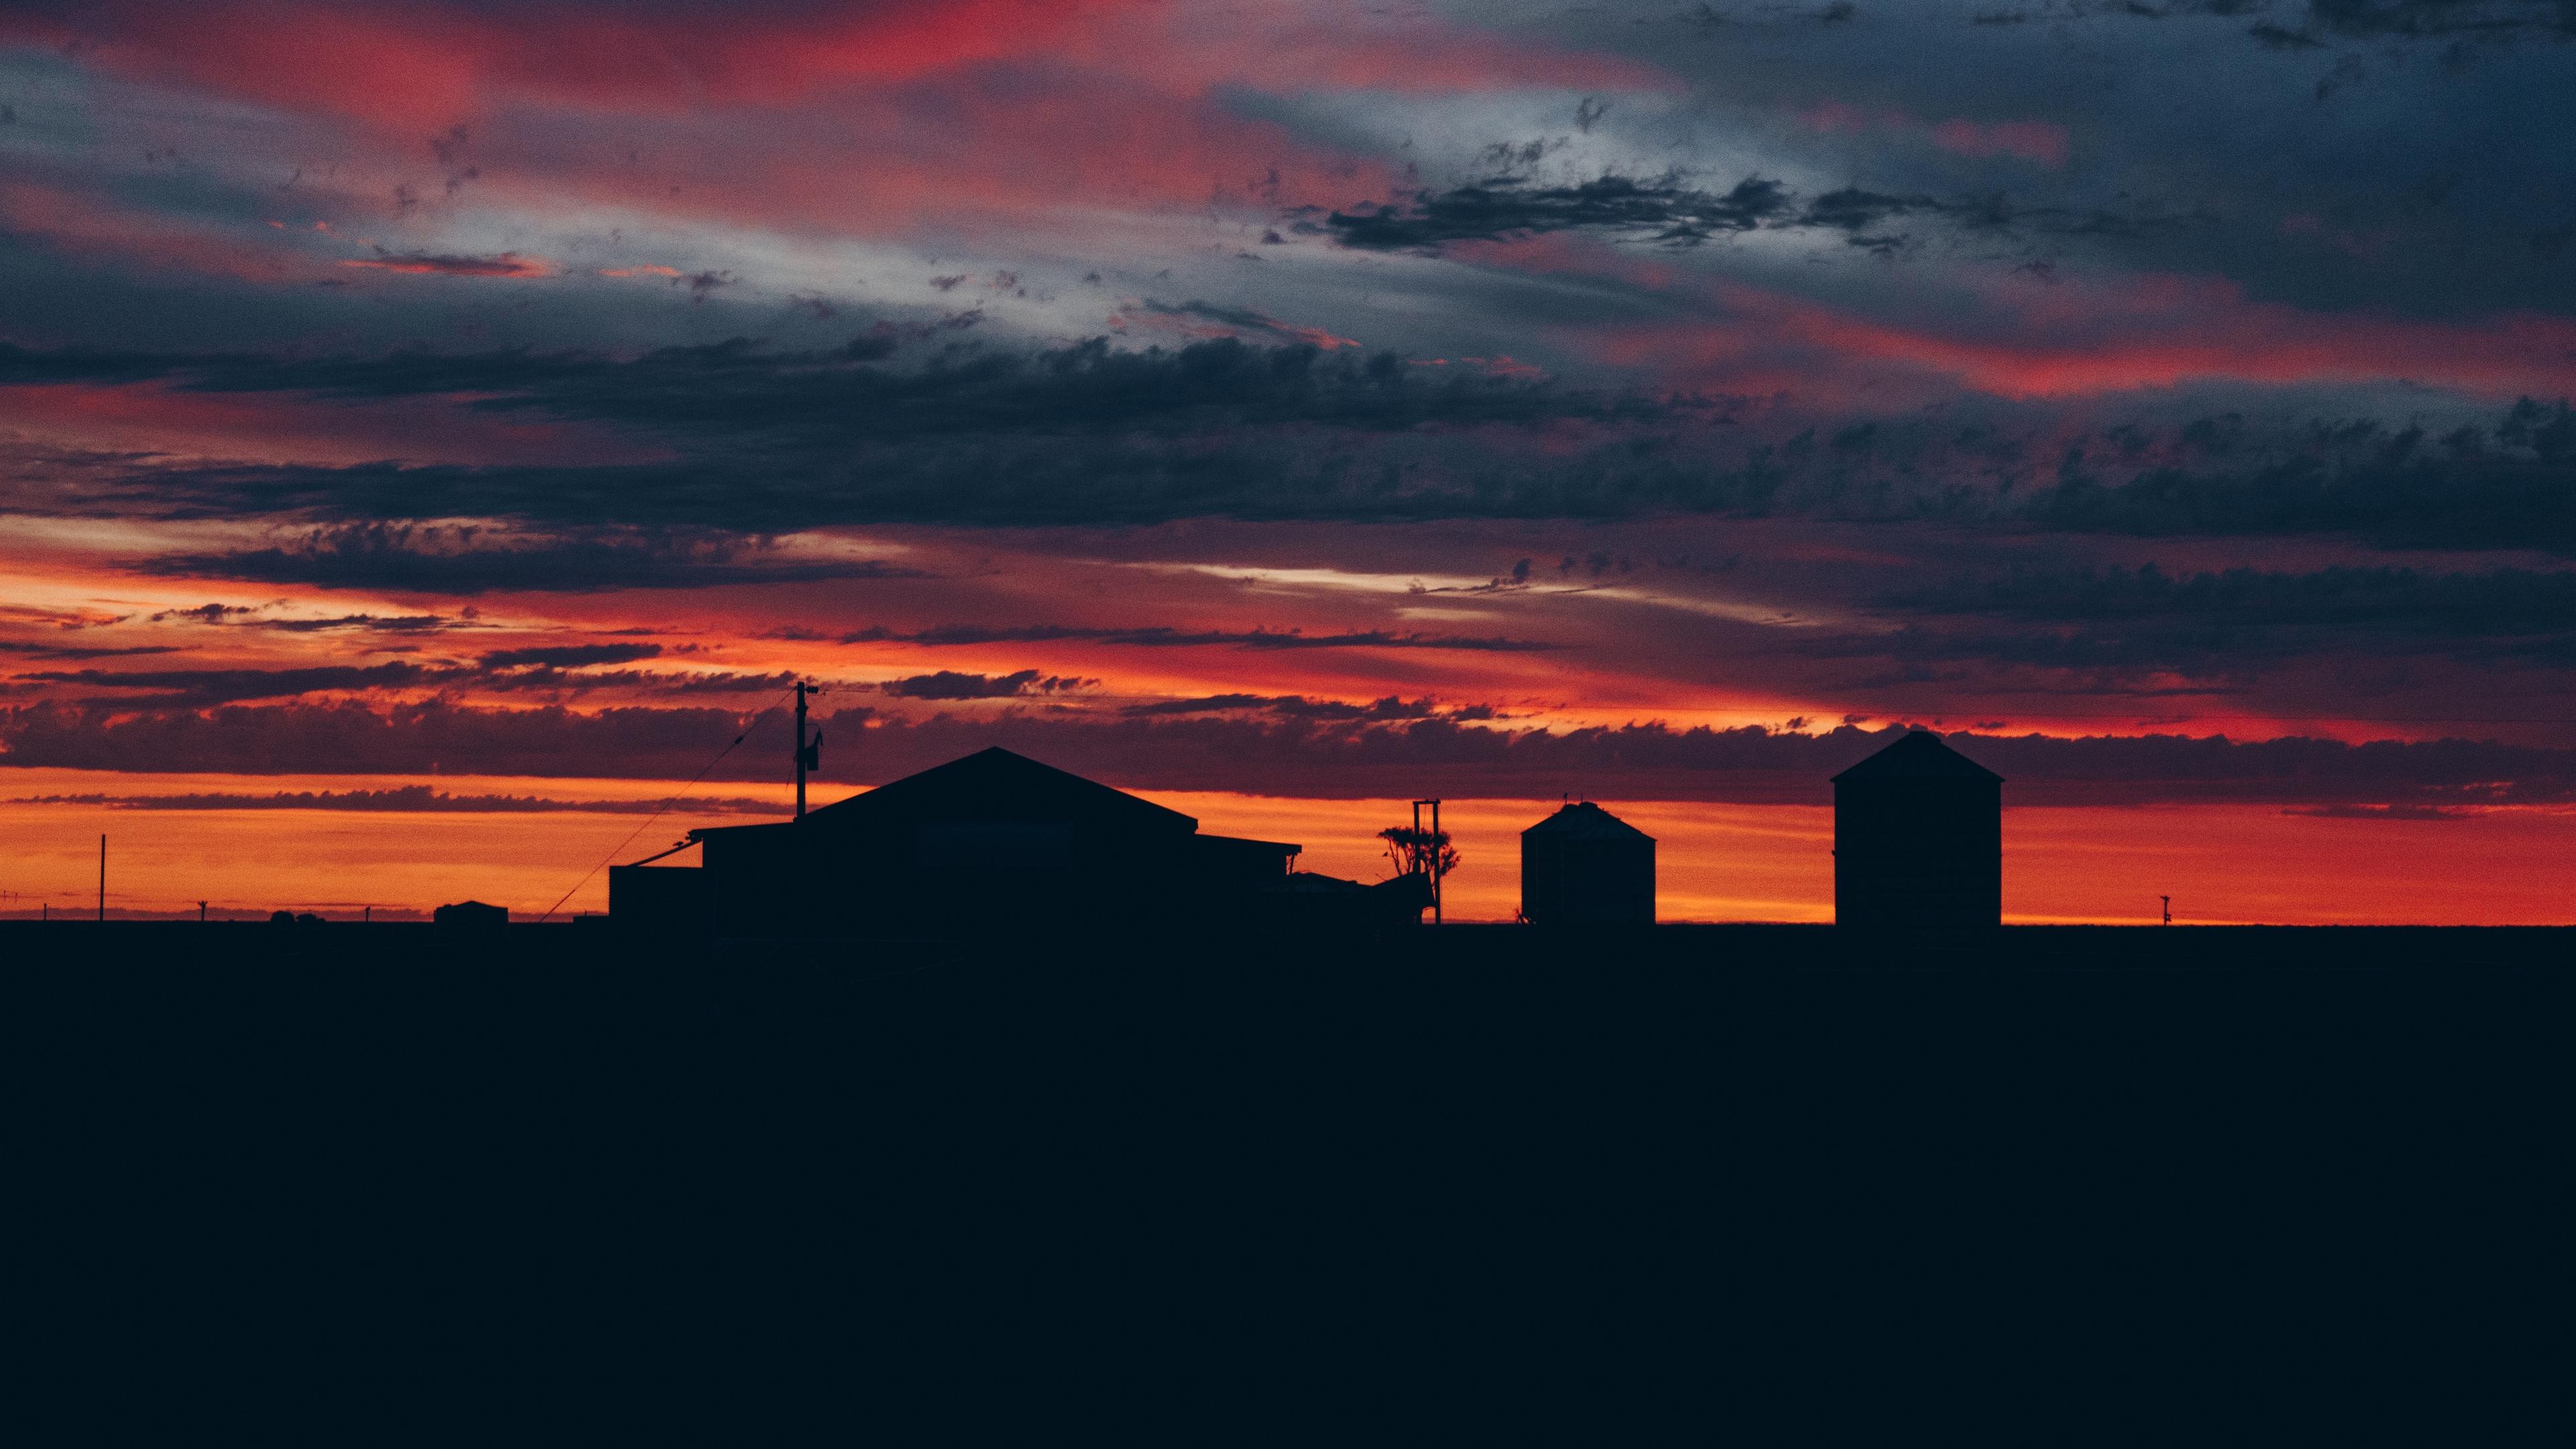 sky sunset building cloudy clouds 4k 1540574455 - sky, sunset, building, cloudy, clouds 4k - sunset, Sky, Building